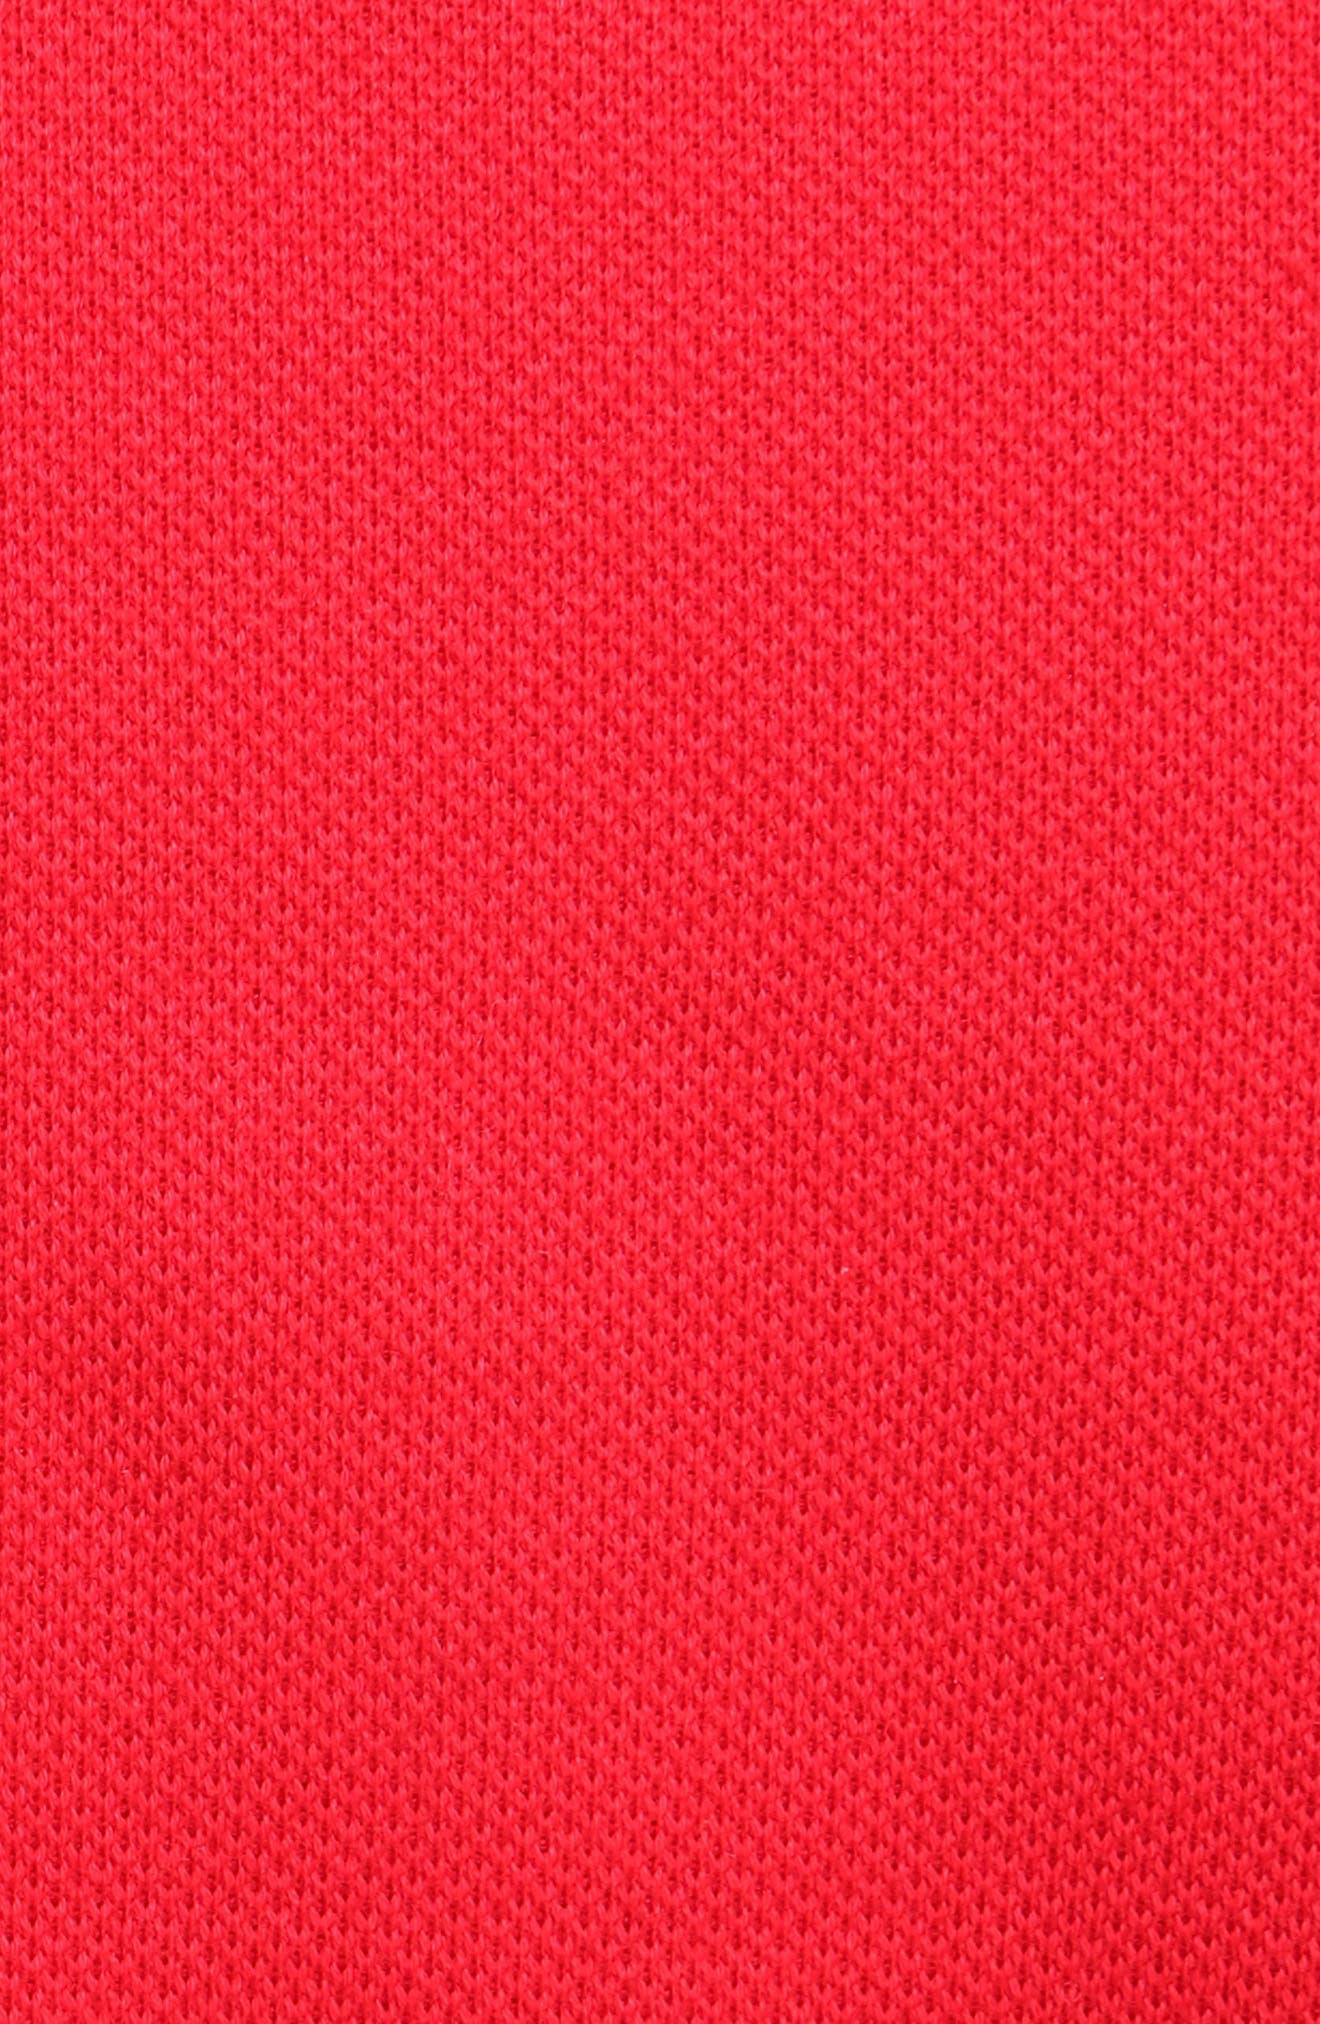 Star Embellished Polo Dress,                             Alternate thumbnail 5, color,                             606